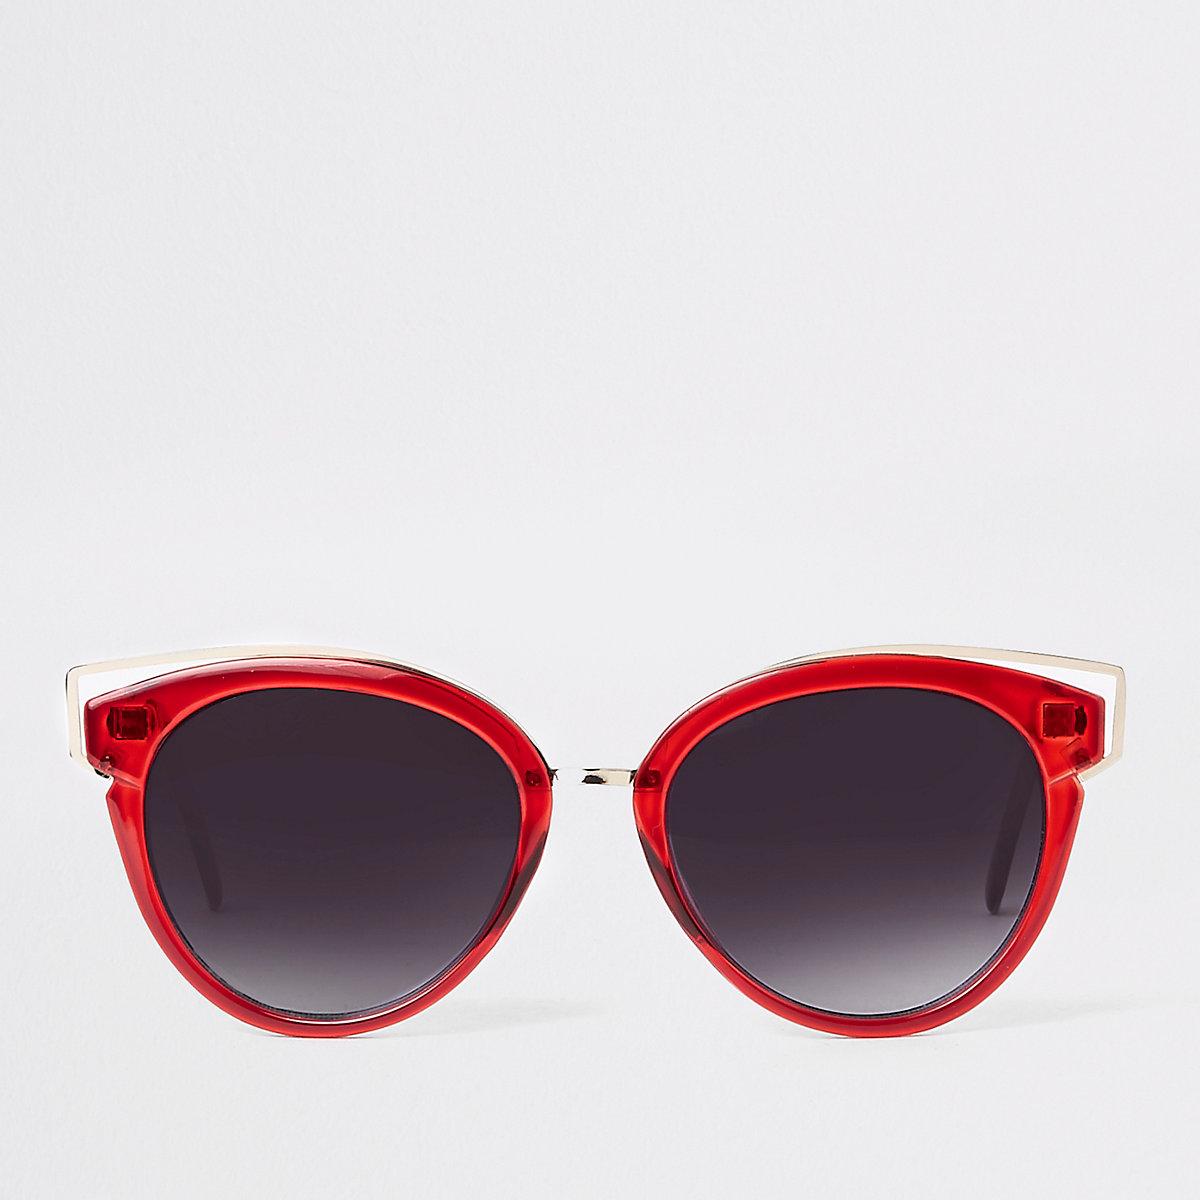 Red smoke lens cat eye sunglasses